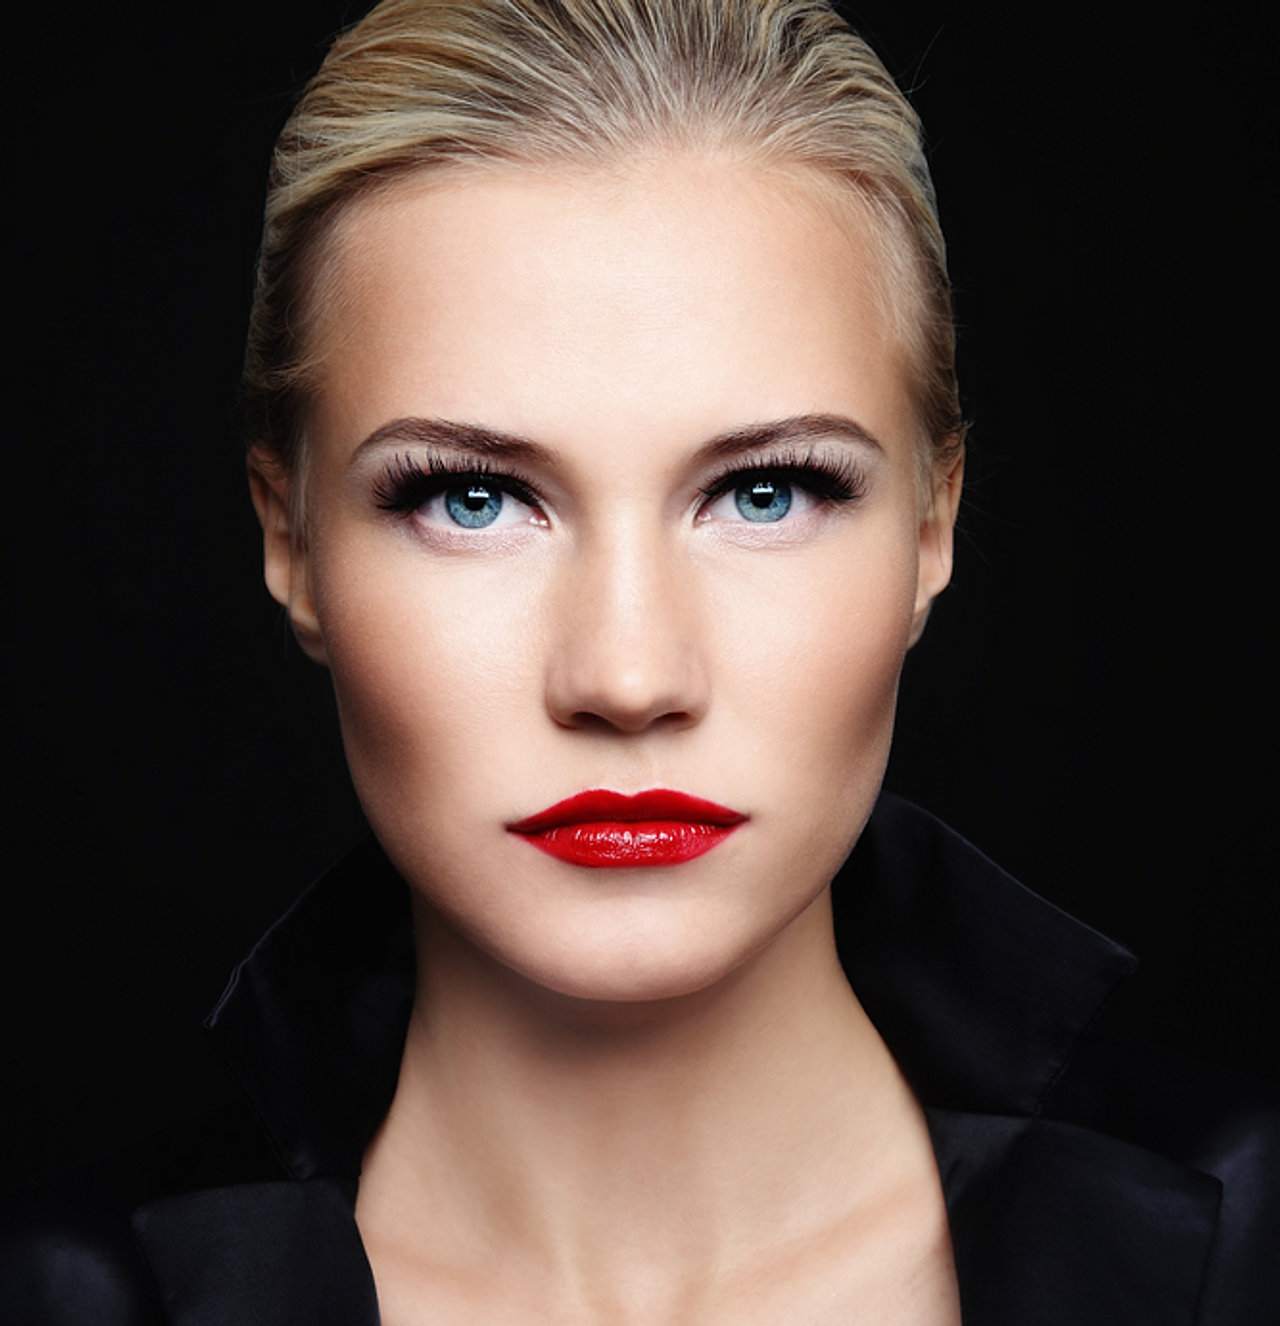 Best Bridal Makeup Artist In West : Perth Makeup Artist, Makeup Artist Perth, South West ...